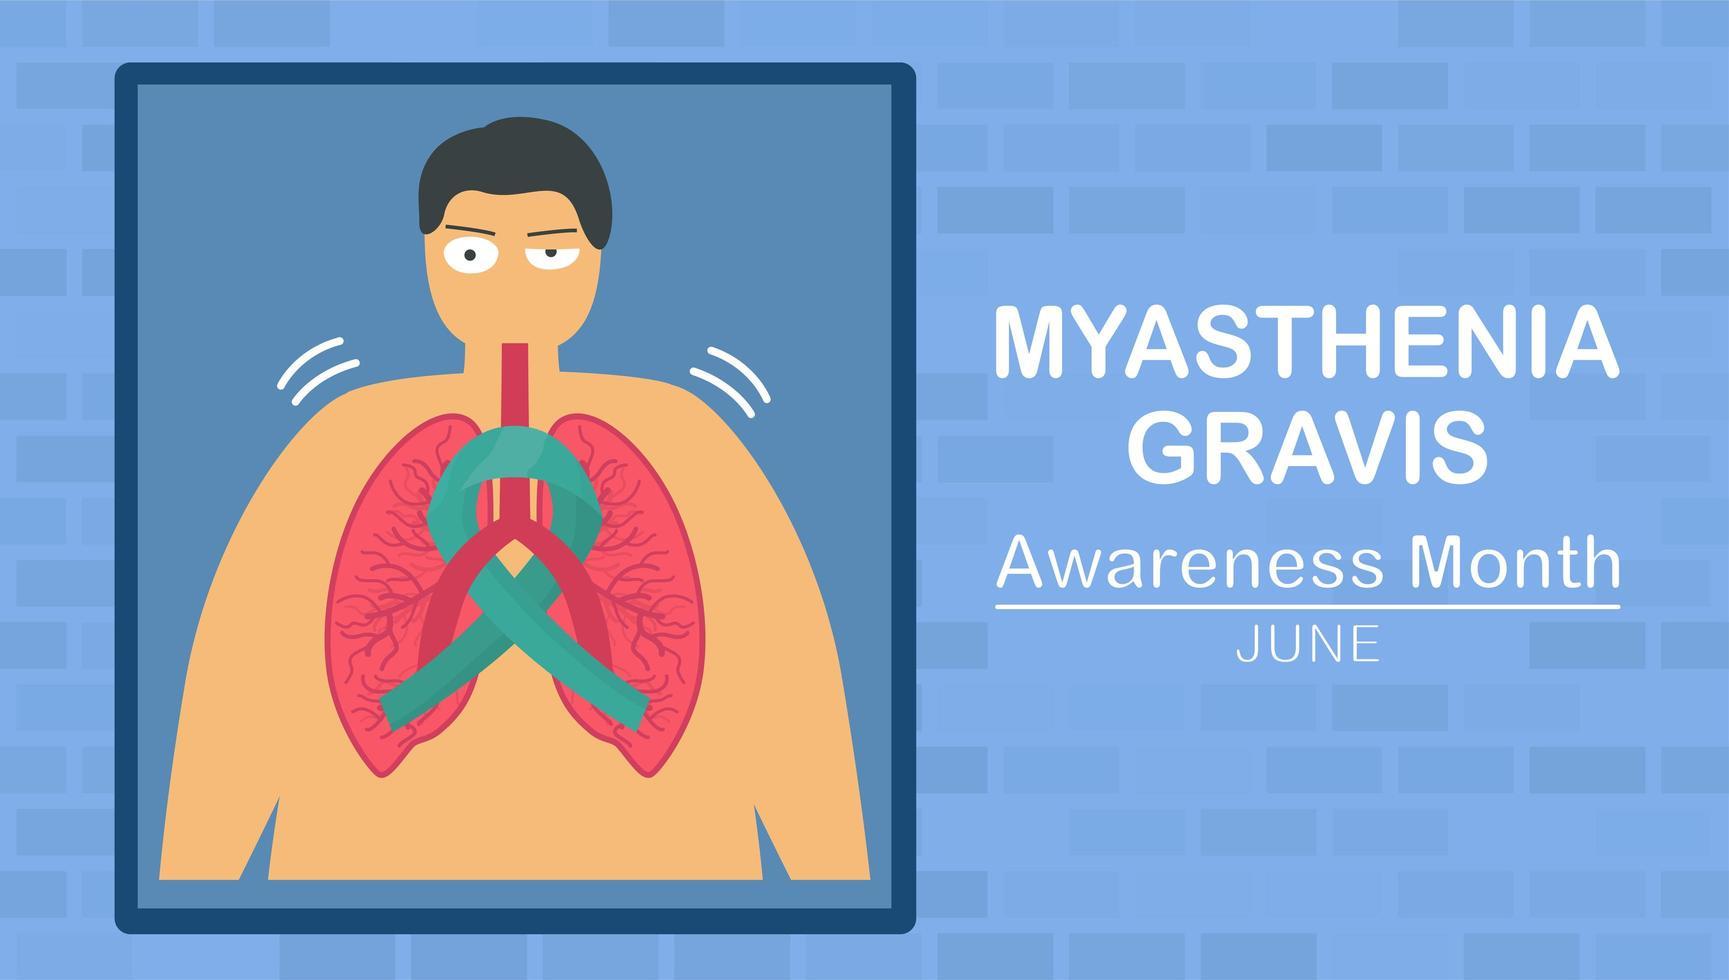 Myasthenia gravis is neuromuscular disease  vector